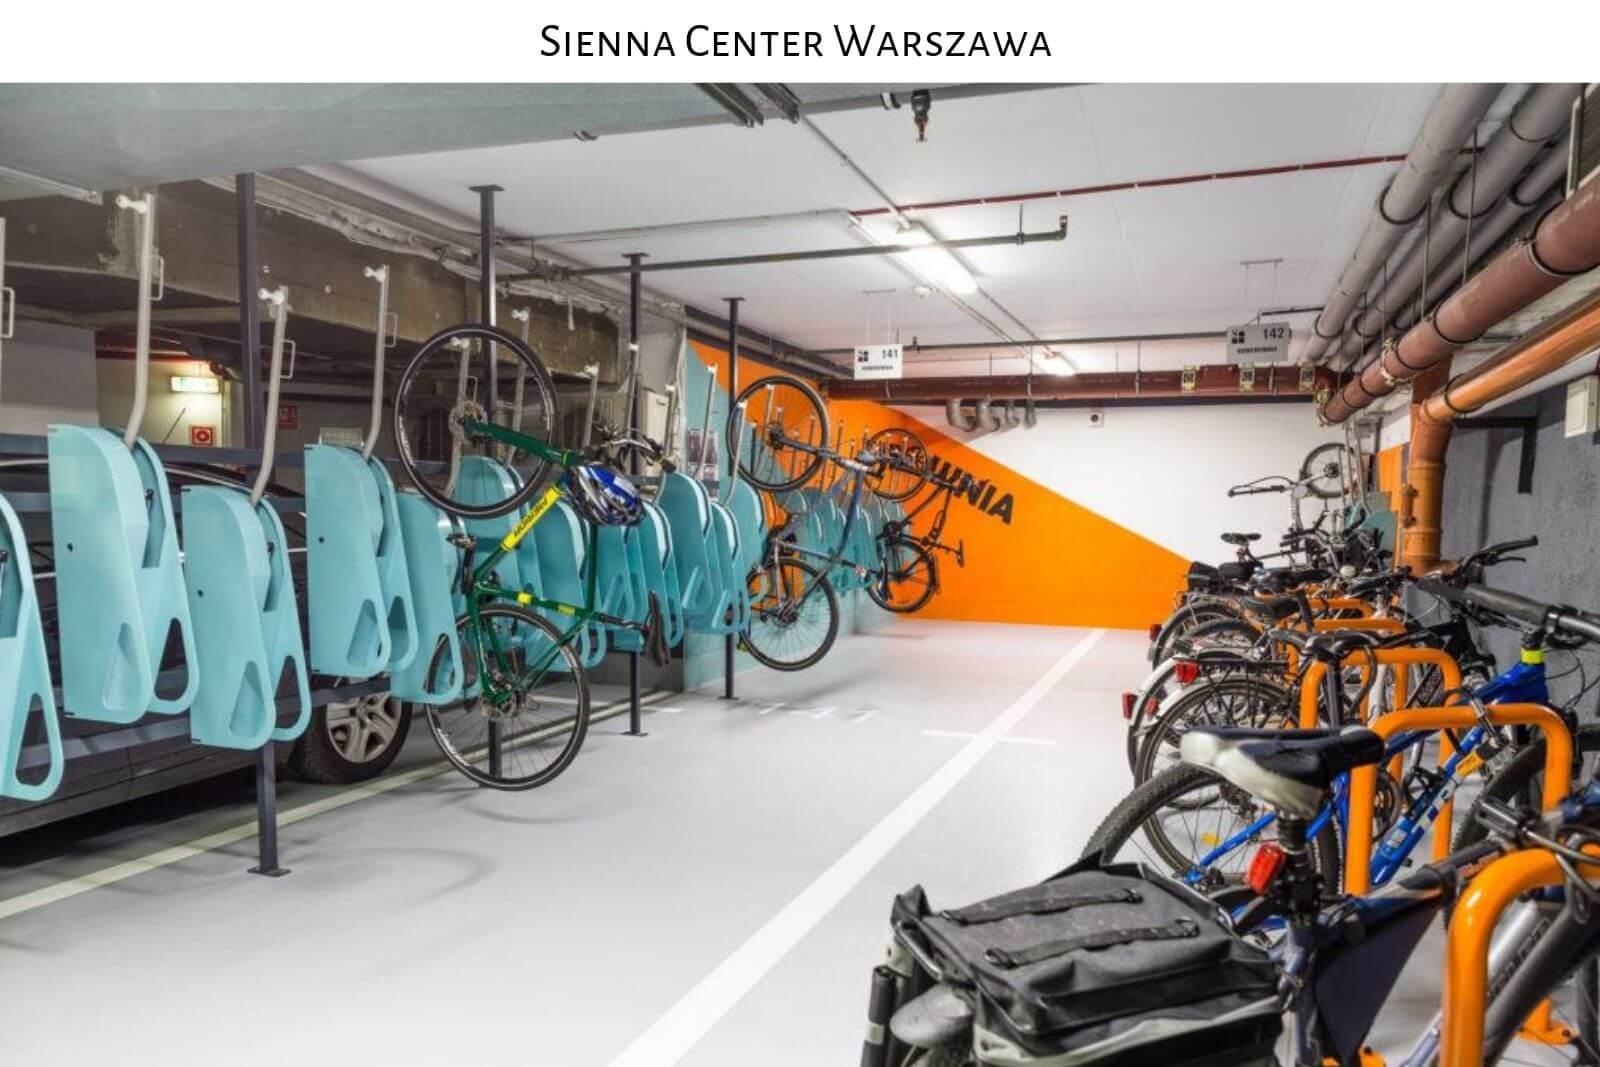 rowerownia sienna center